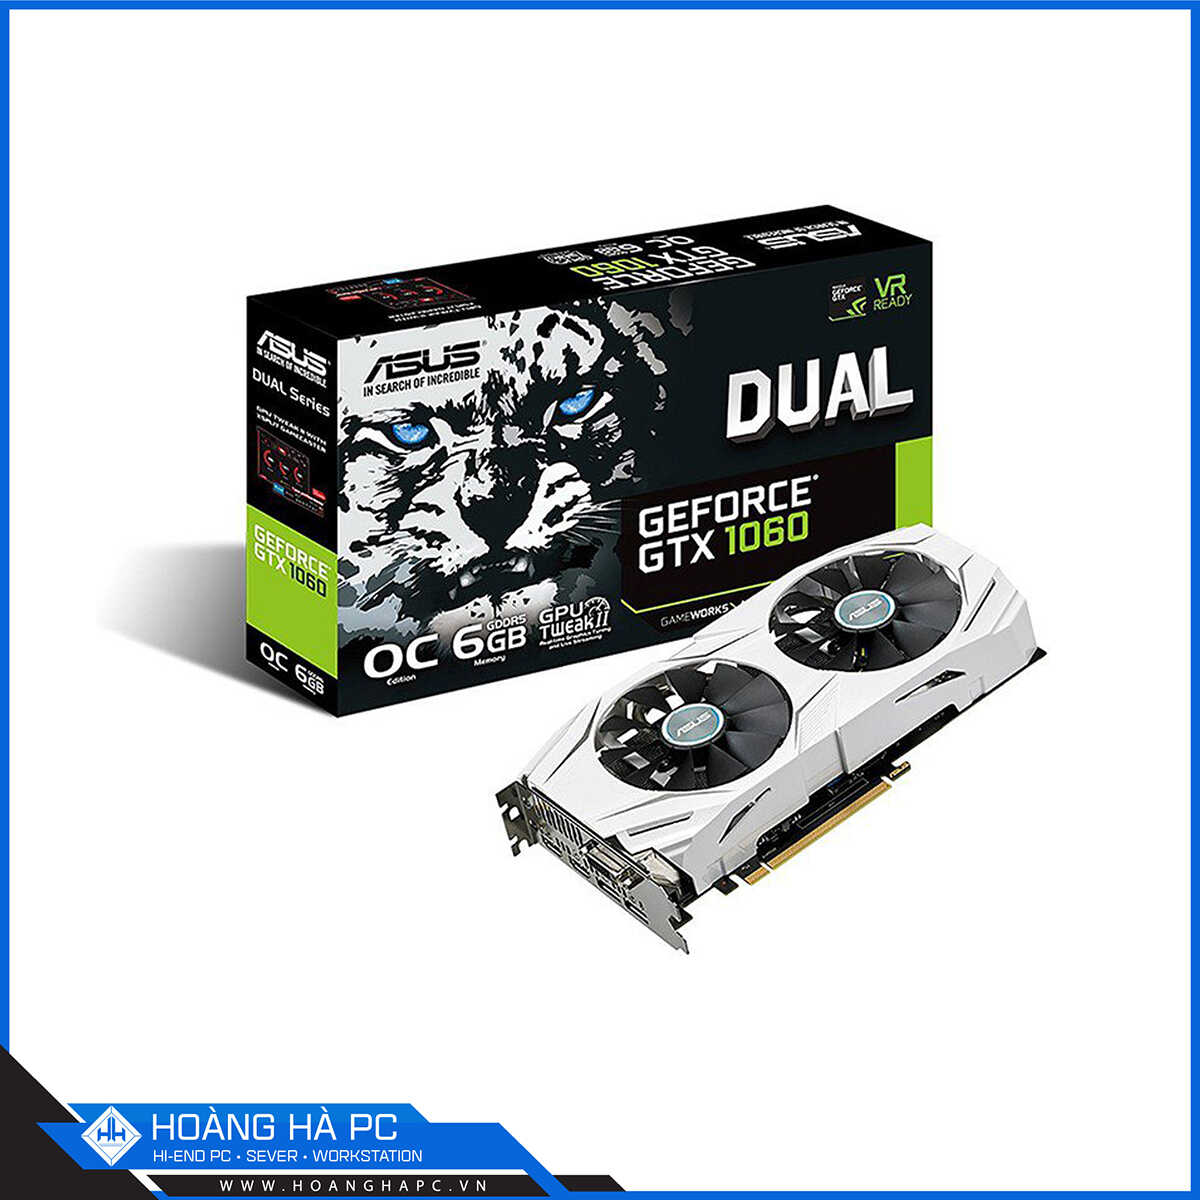 VGA Asus Dual Geforce GTX 1060 6GB